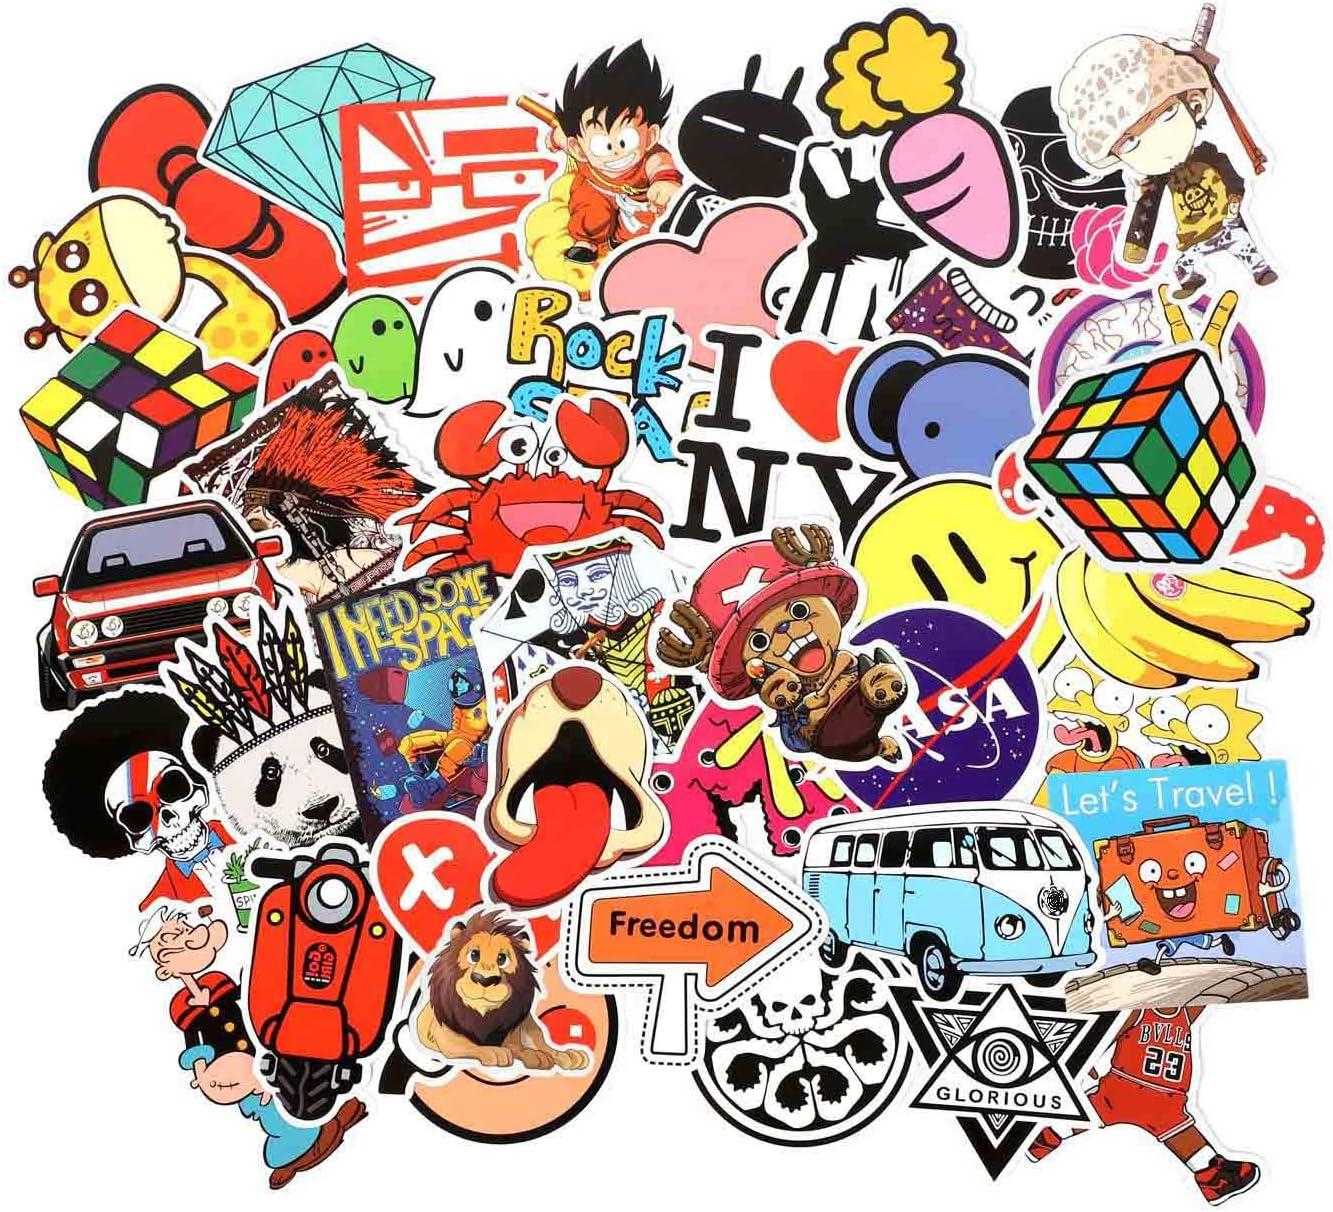 Details about  /Random Graffiti Stickers Kids Child Cartoon Sticker Laptop Skateboard Decals